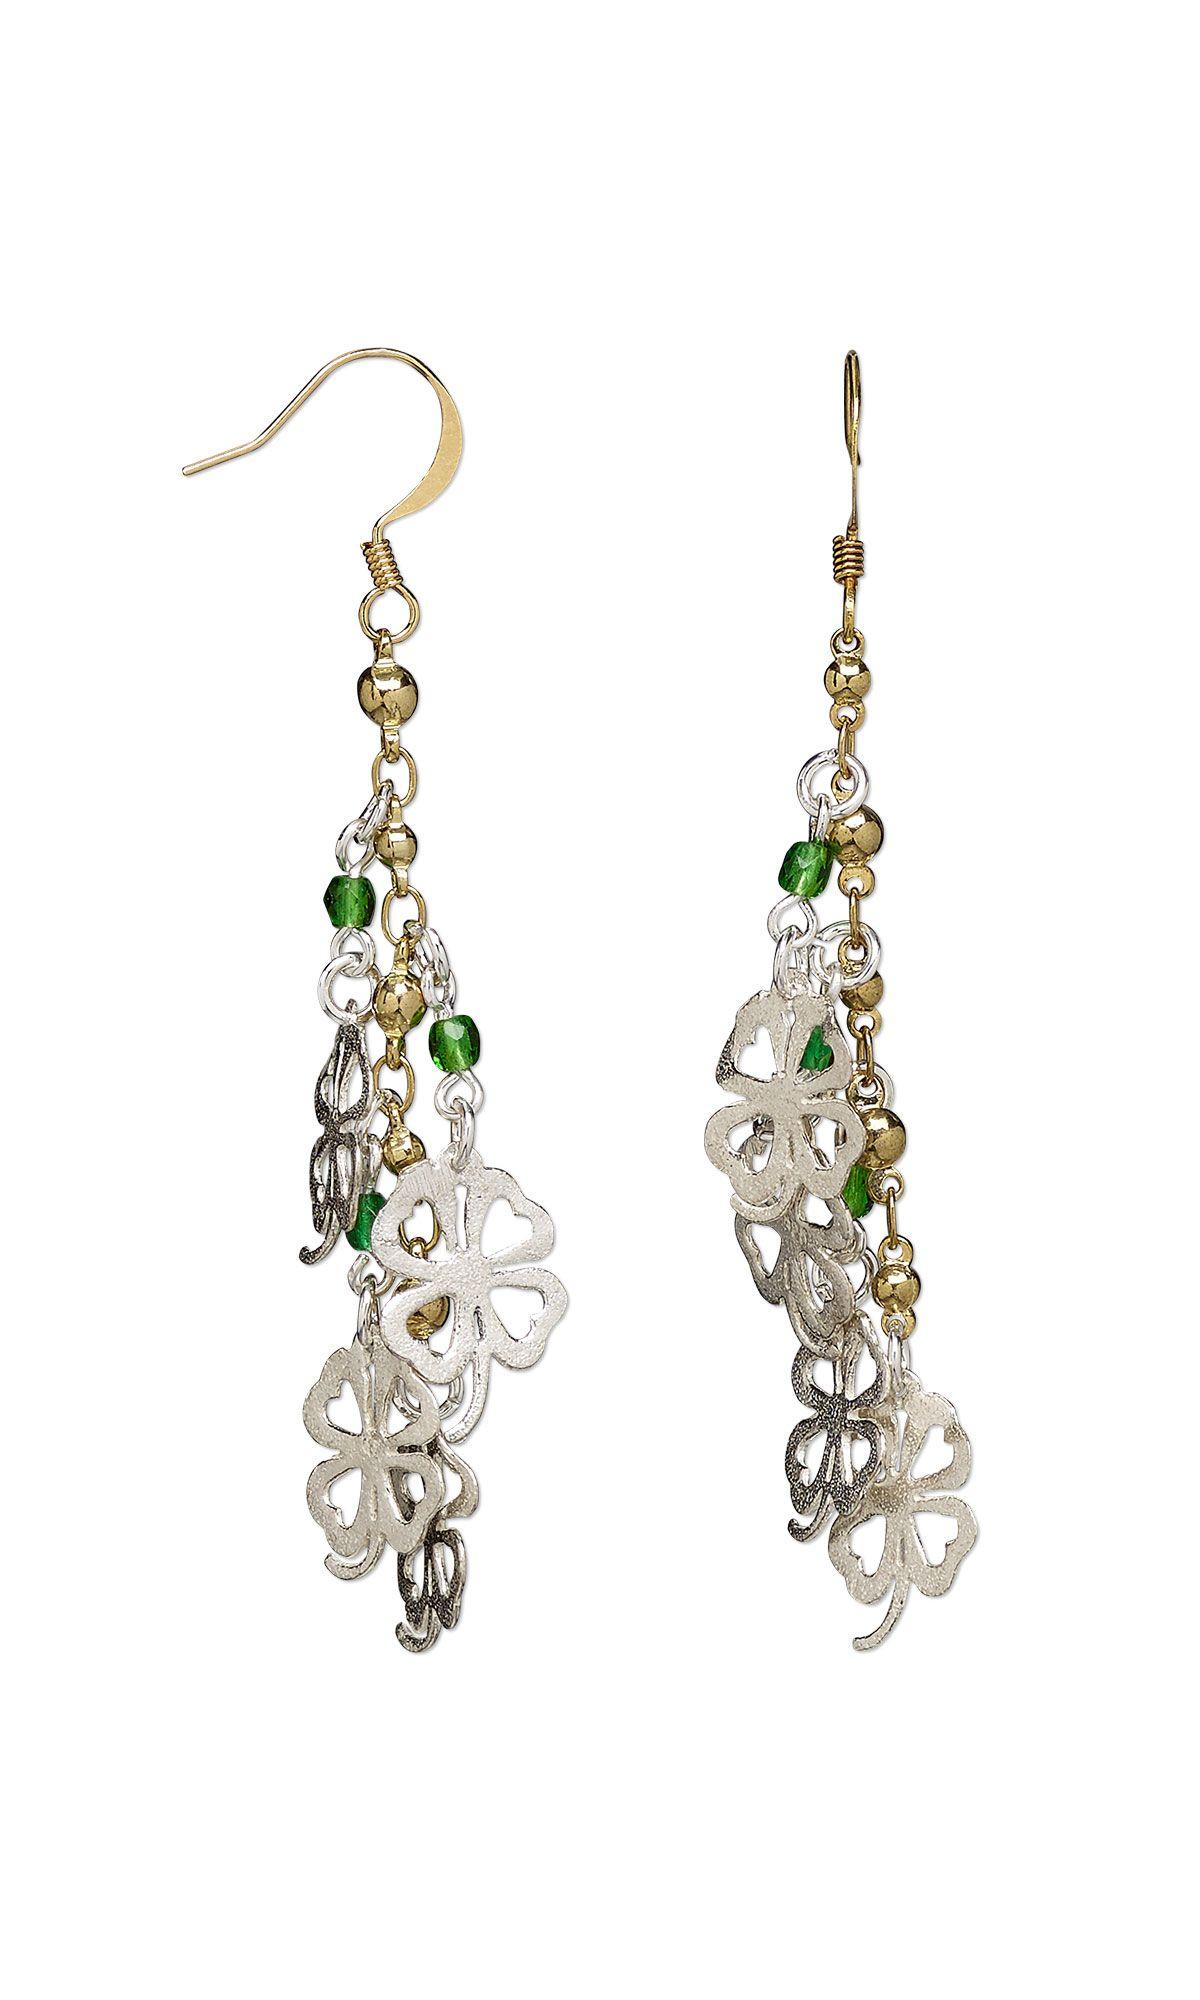 Cascading Clovers #diyEarrings  #beading #diyjewelrymaking #jewelrymaking #StPatricksJewelry